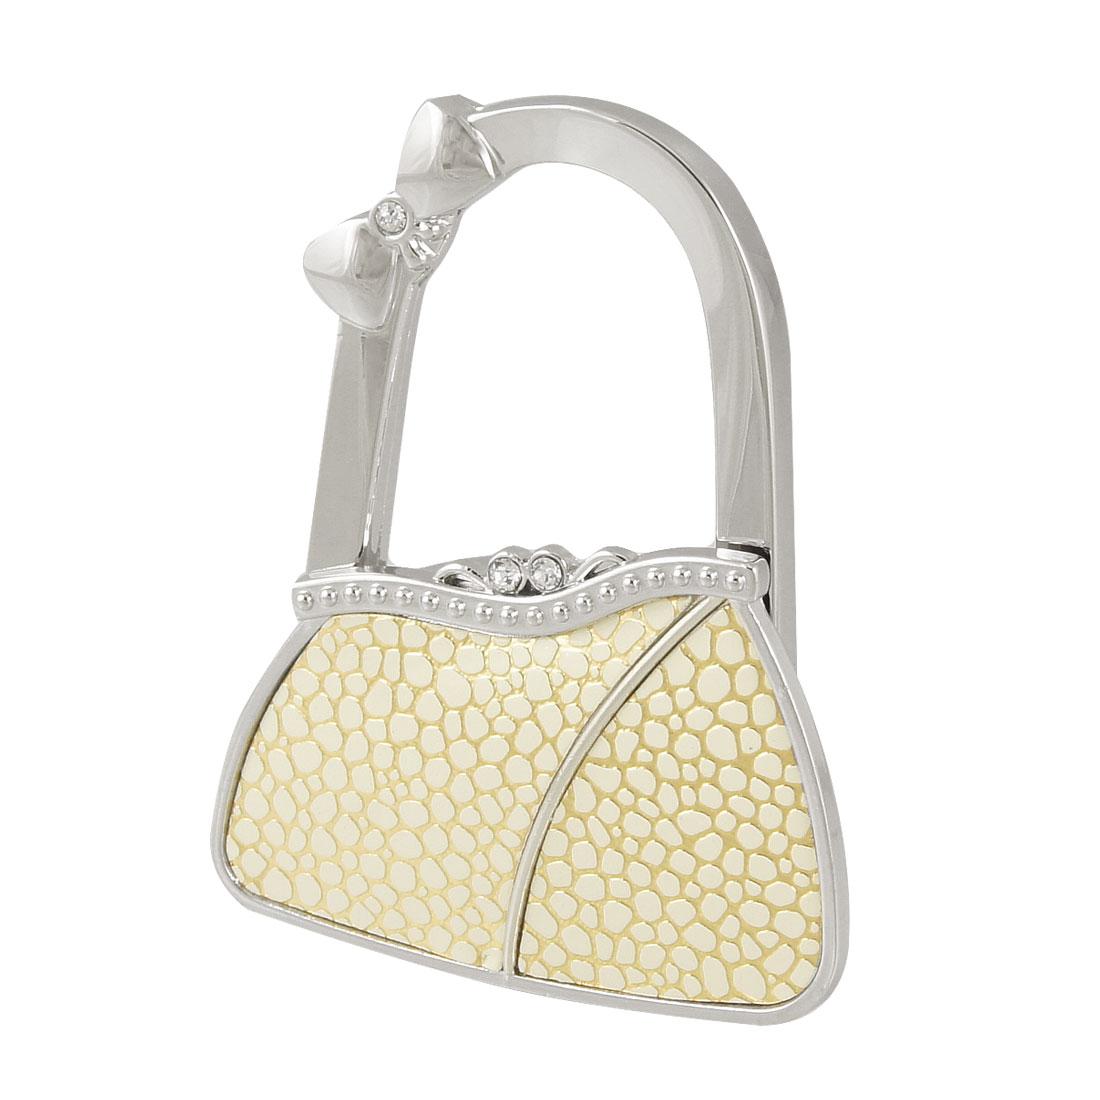 Gold Tone Beige Cobble Prints Metal Bag Shaped Foldable Handbag Hook